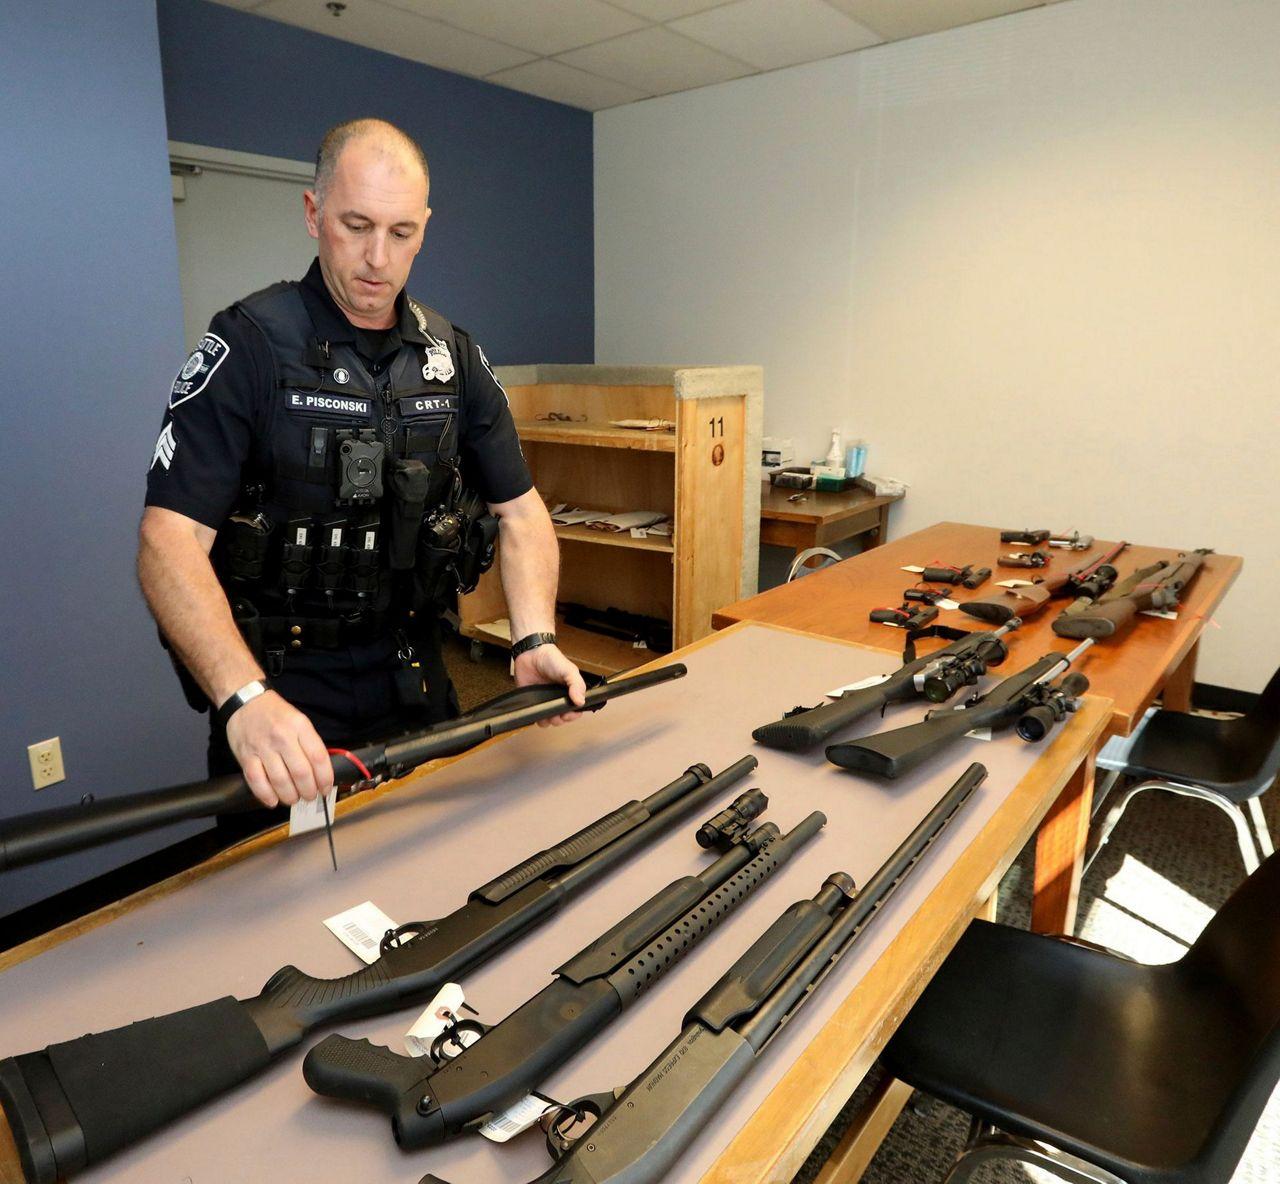 Gun-Seizure Laws Grow In Popularity Since Parkland Shooting